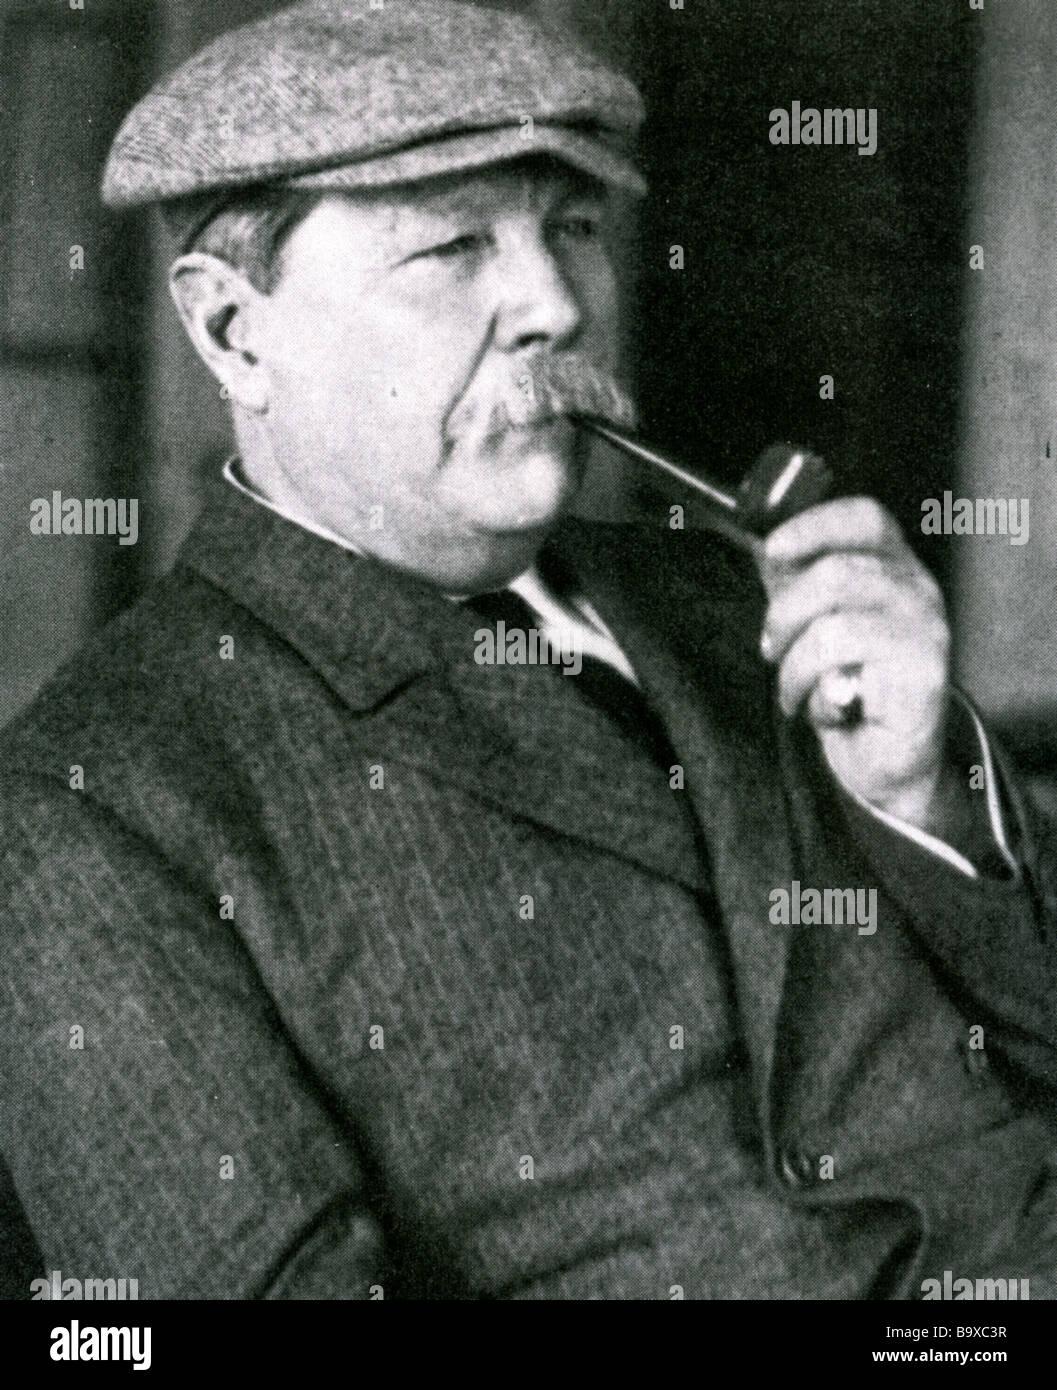 SIR ARTHUR CONAN DOYLE English writer and creator of Sherlock Holmes - Stock Image